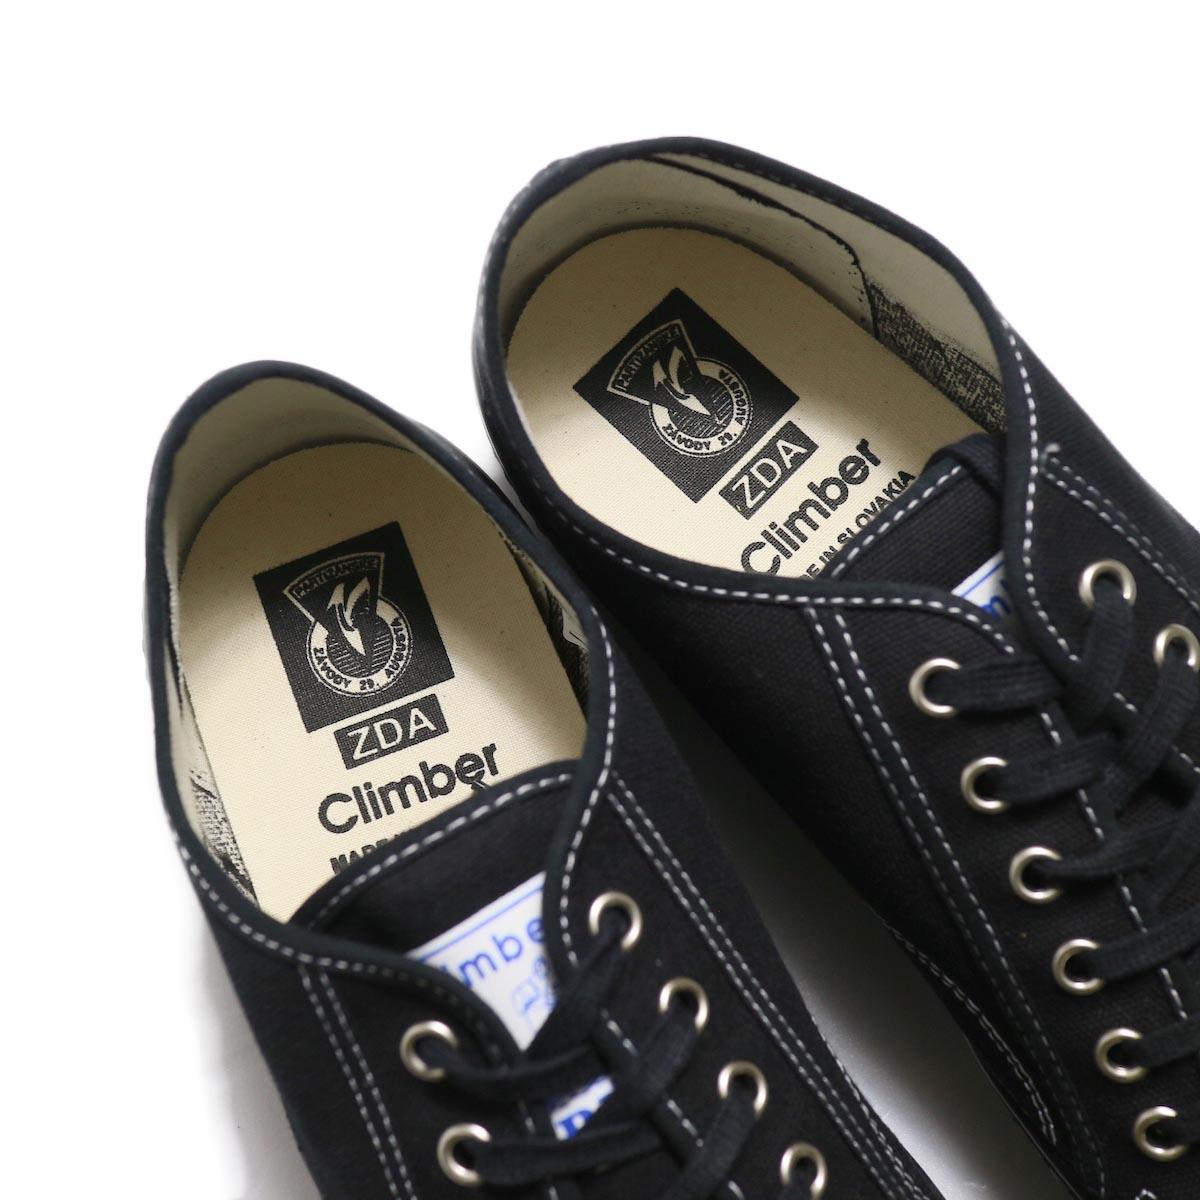 ZDA / 2100-F Climber Sole Cnavas Sneaker (Black)インソール